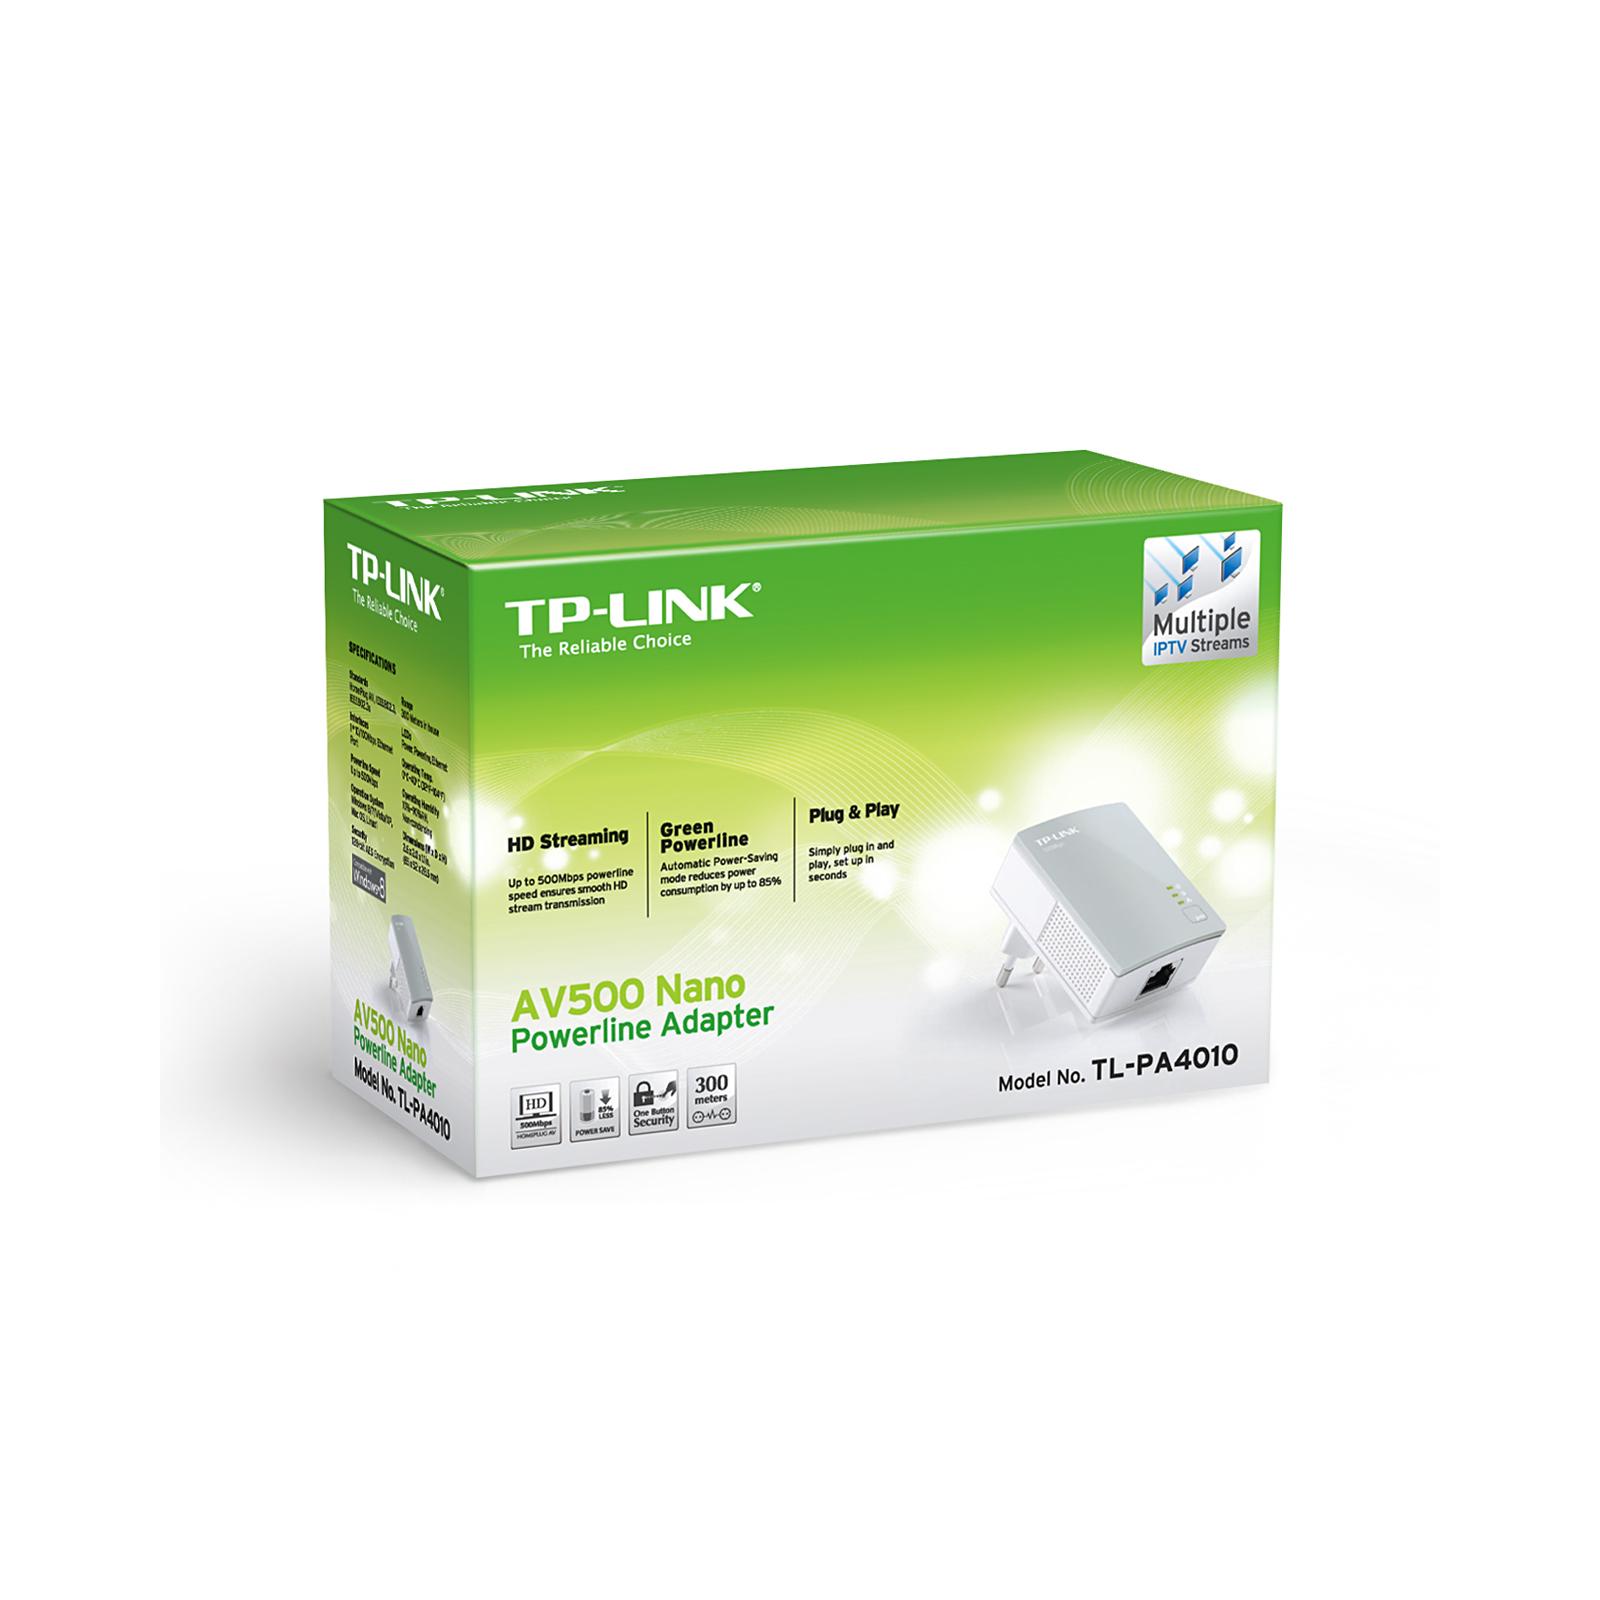 Адаптер Powerline TP-Link TL-PA4010 изображение 6